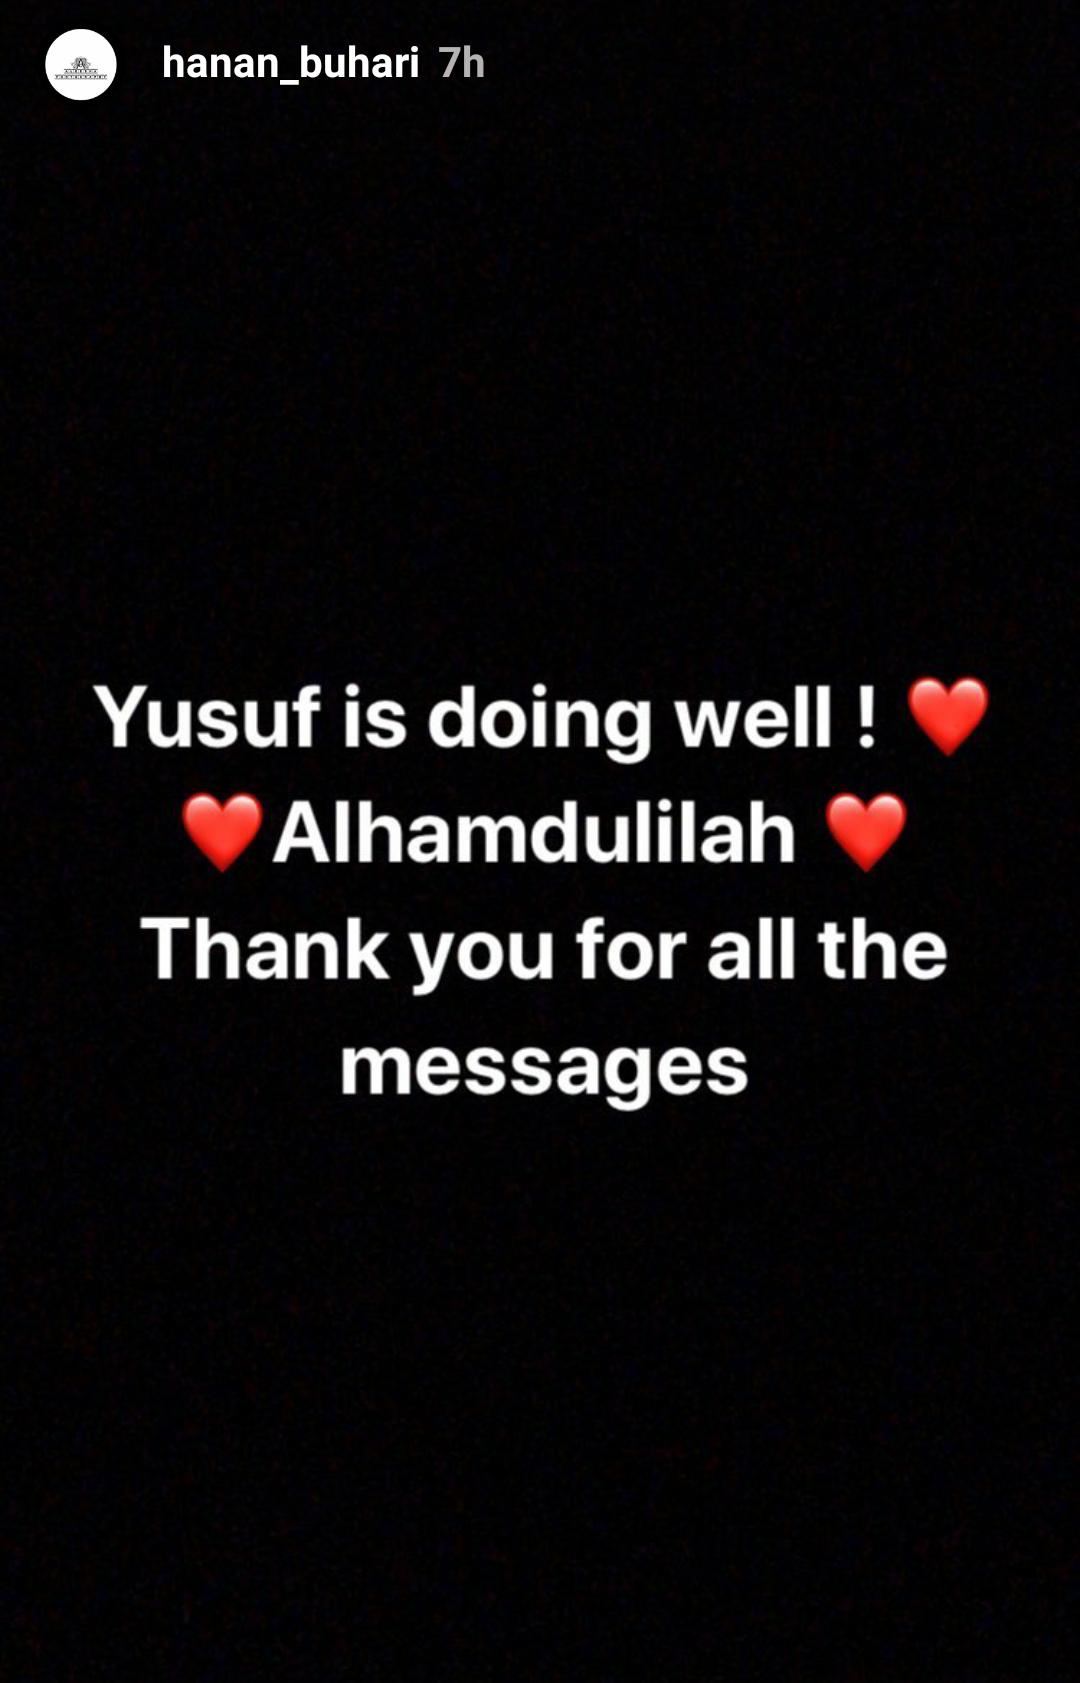 """""Yusuf is doing well"" President Buhari"